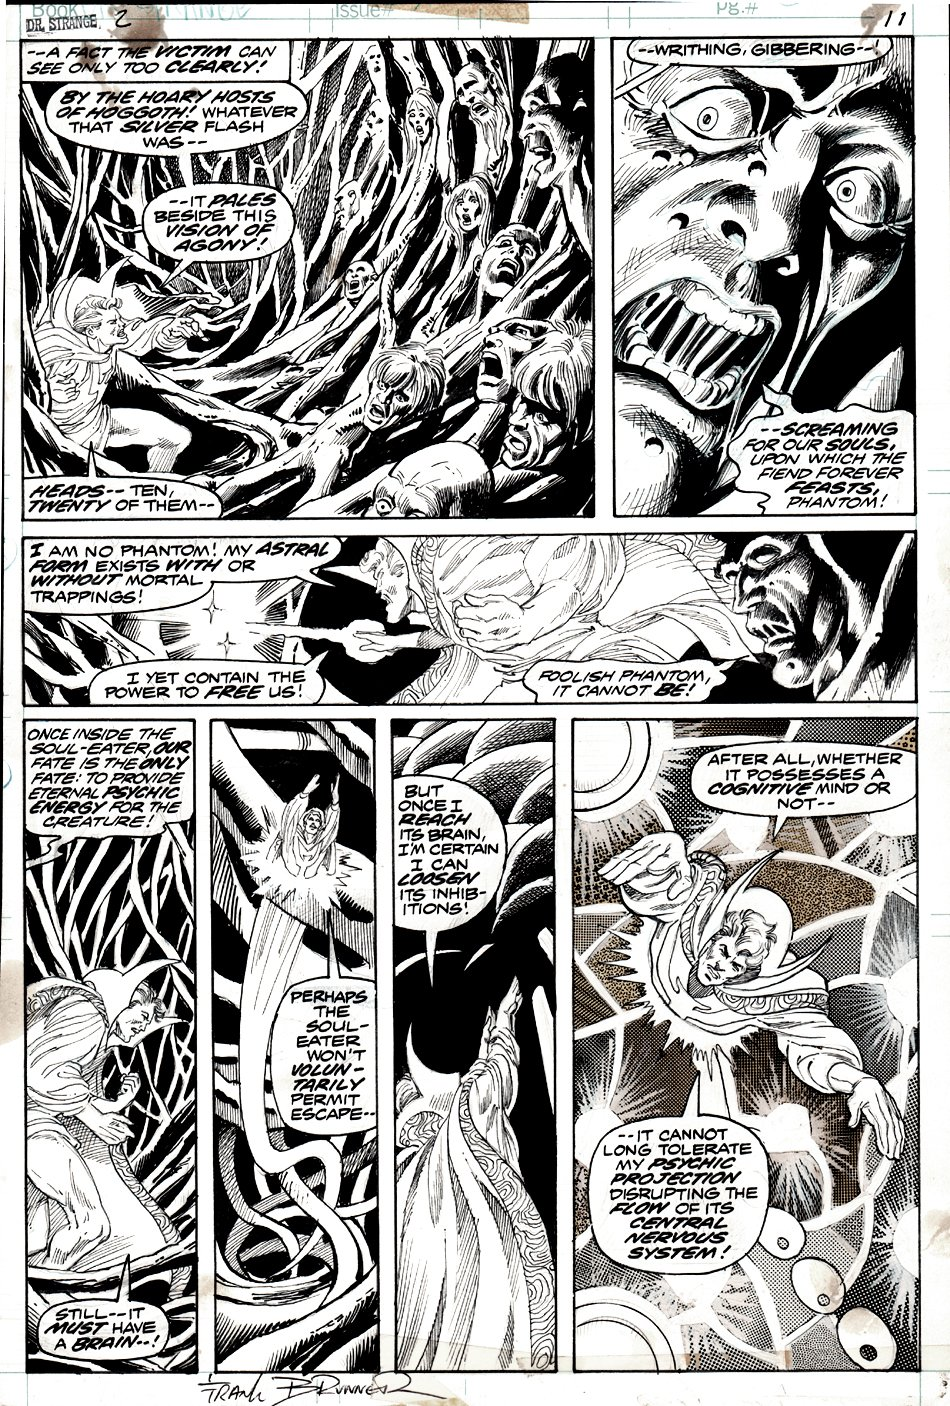 Doctor Strange #2 p 11 (DR STRANGE IN 6 GREAT PANELS!) 1974